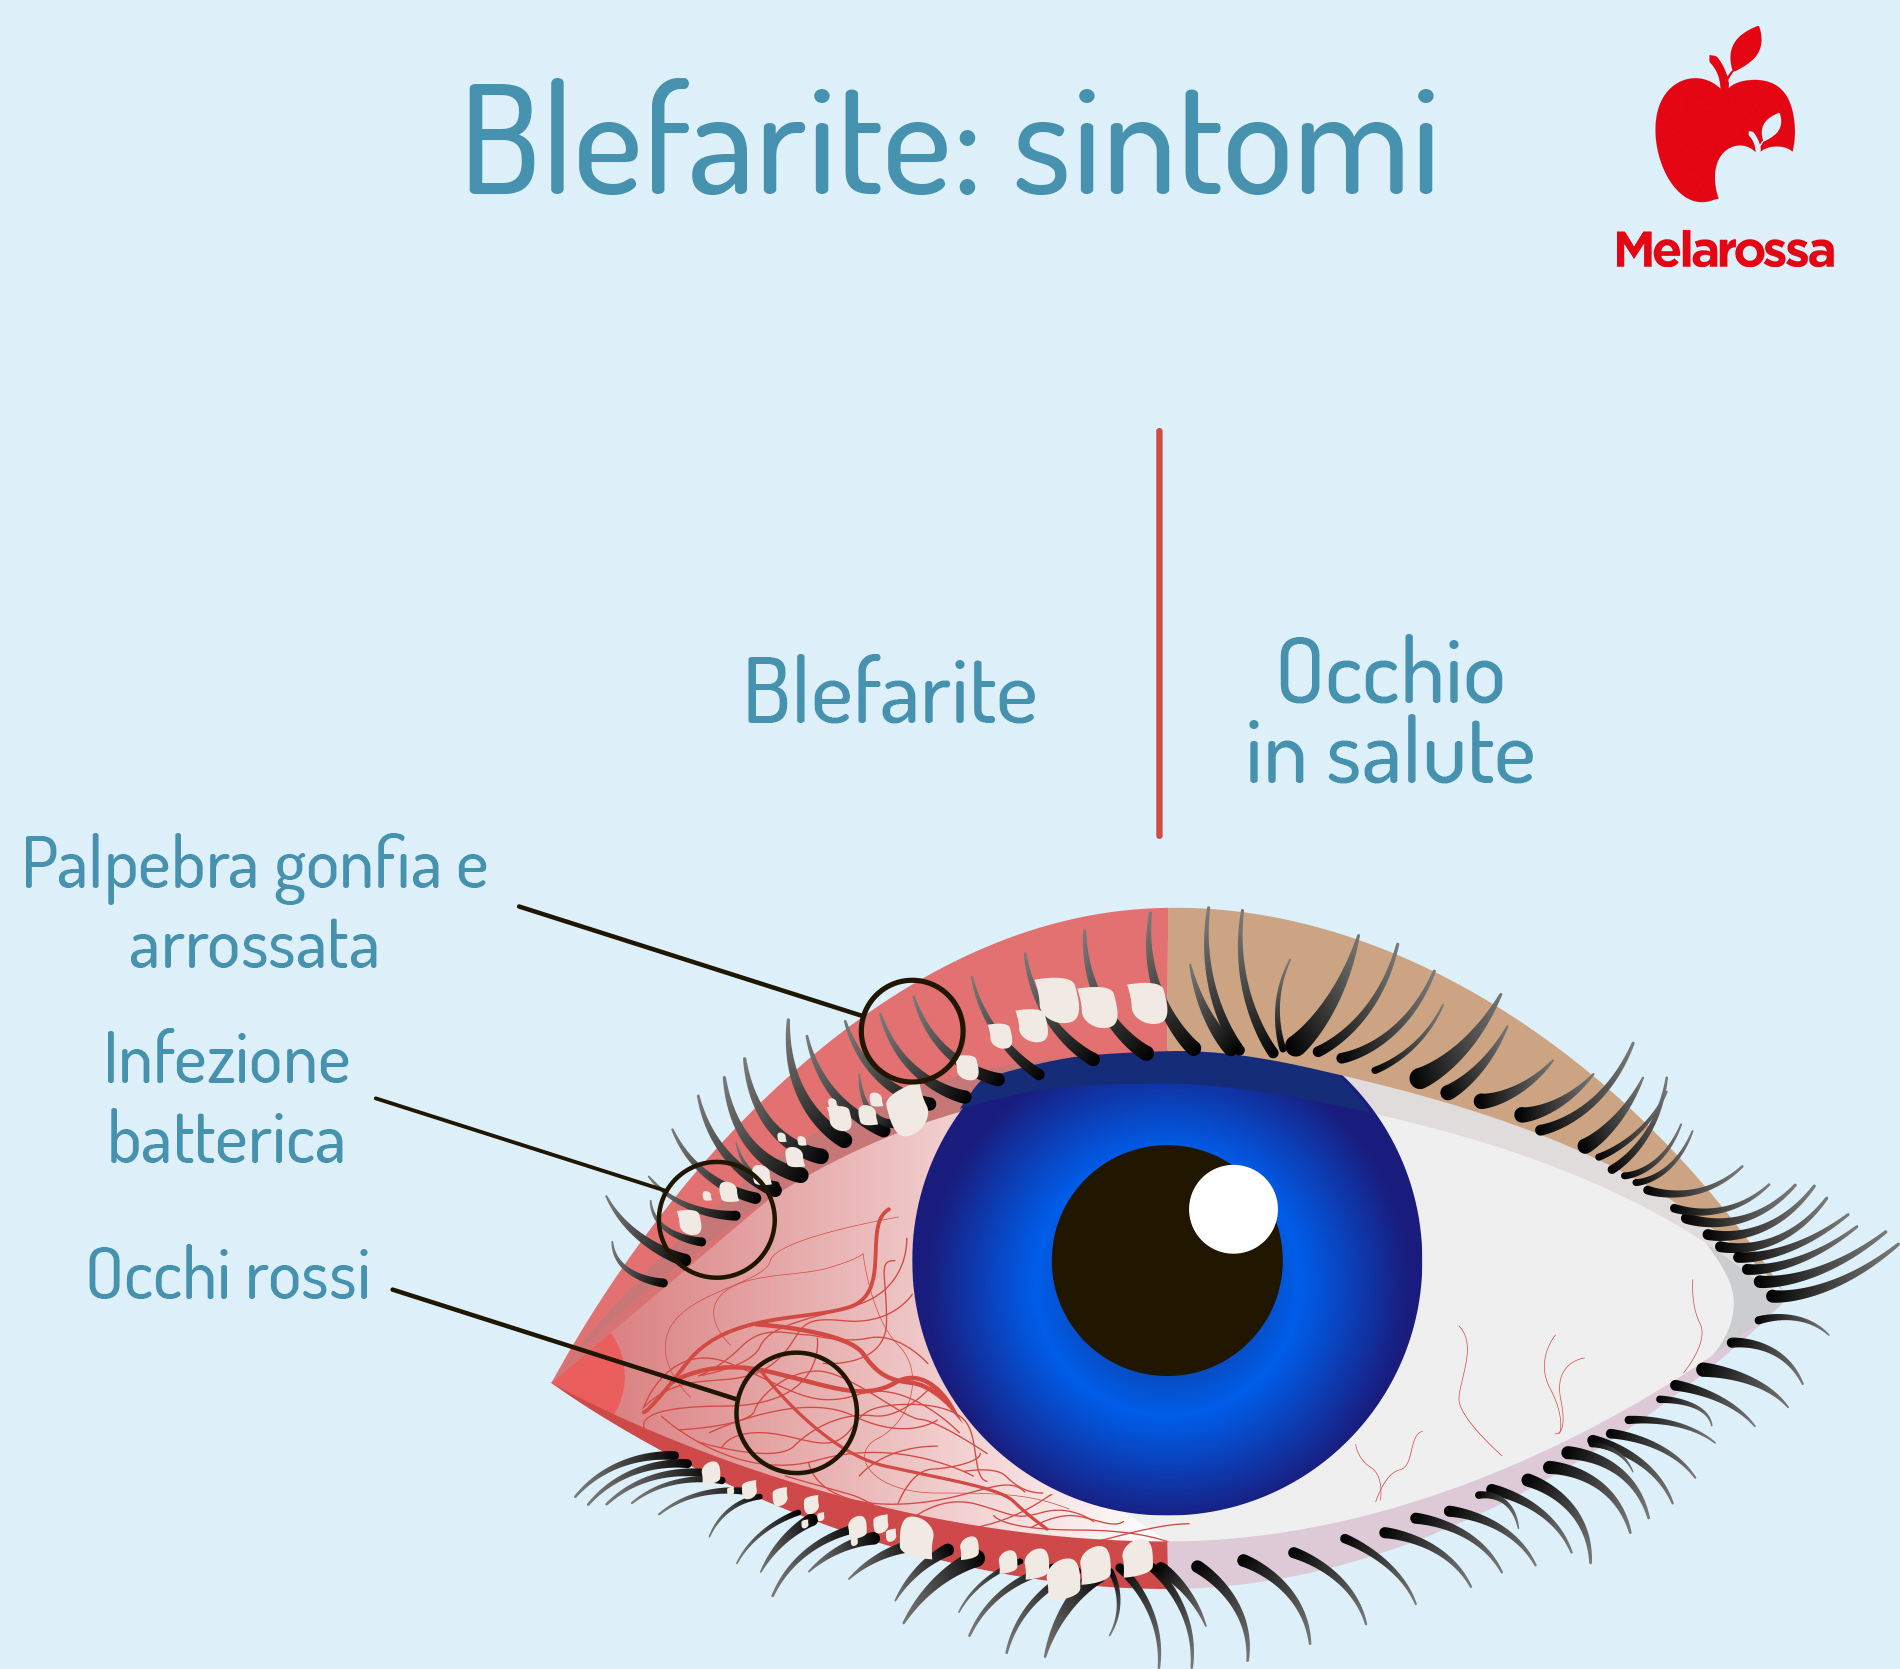 blefarite: sintomi